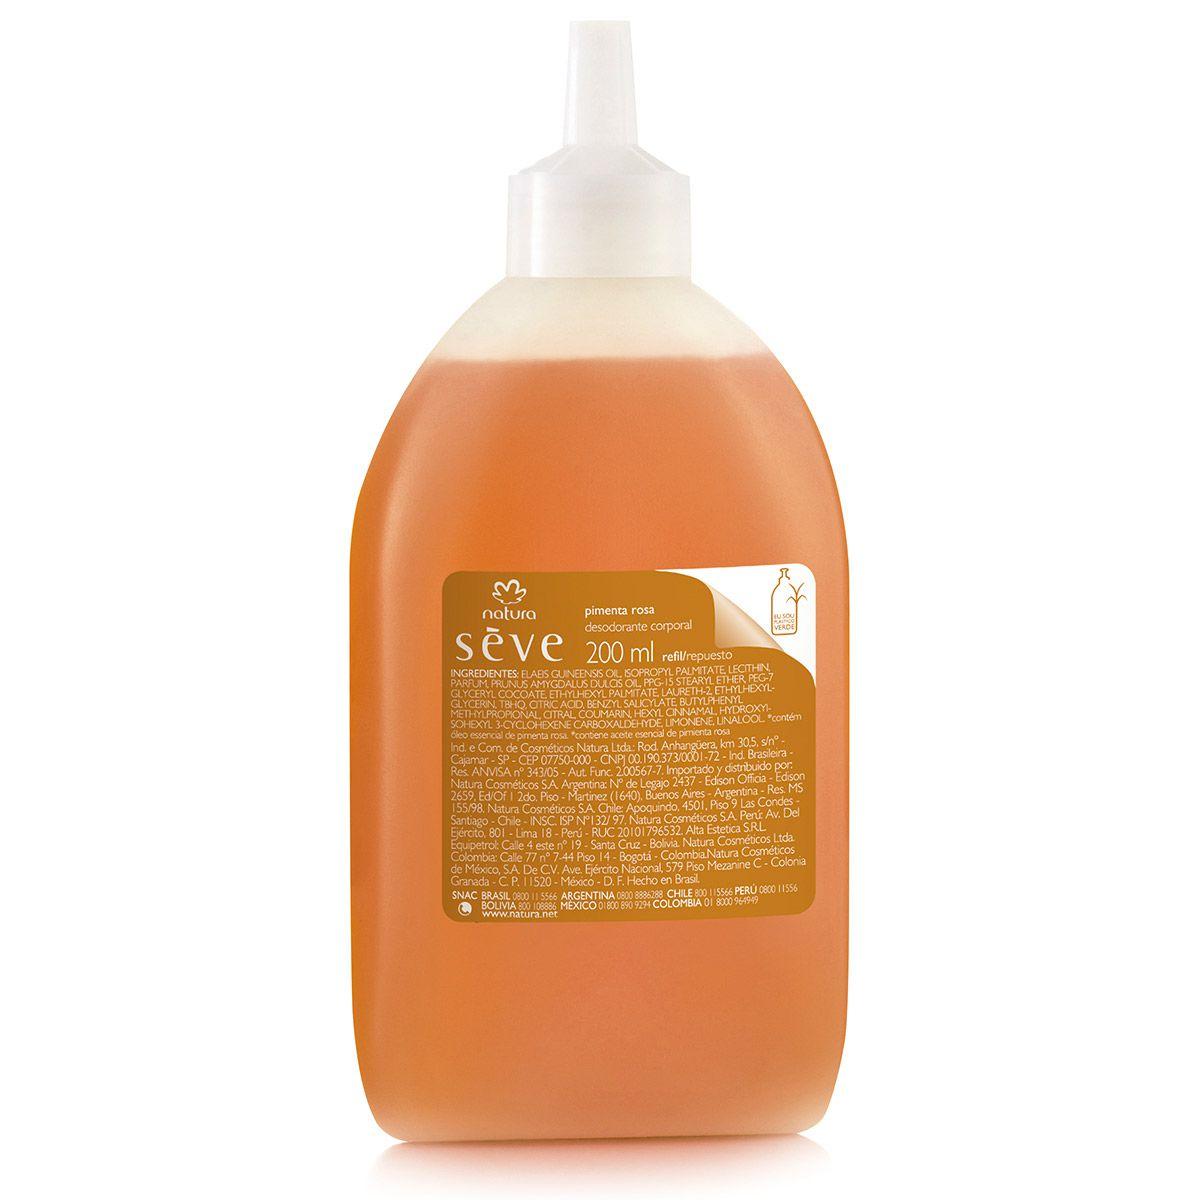 Refil Óleo Desodorante Corporal Natura Sève Pimenta Rosa 200ml